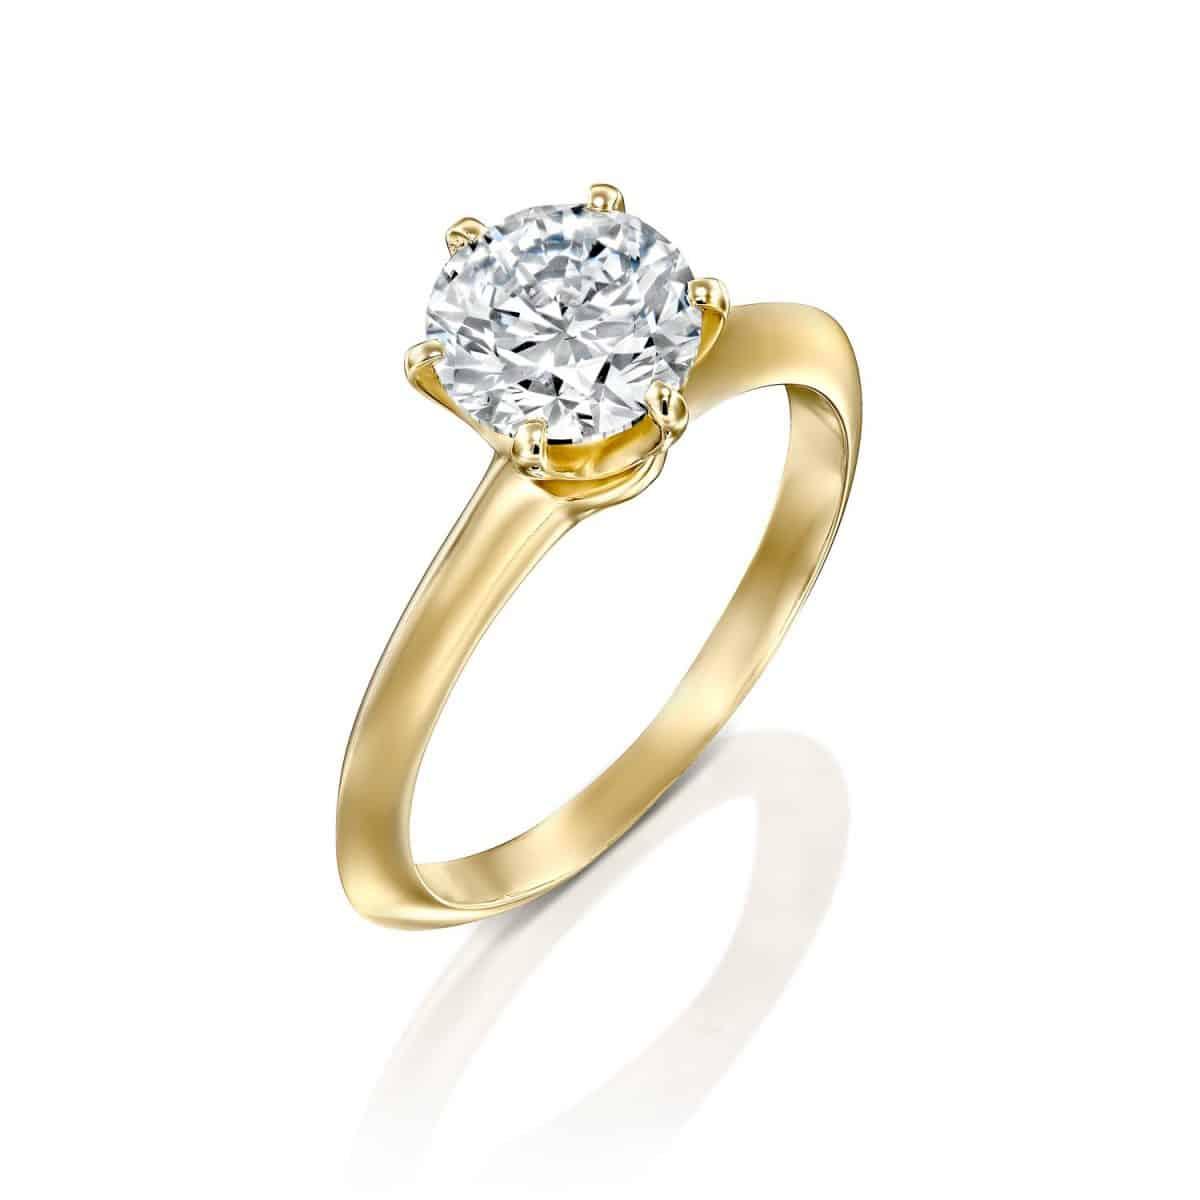 1.51 carat Helen engagement ring